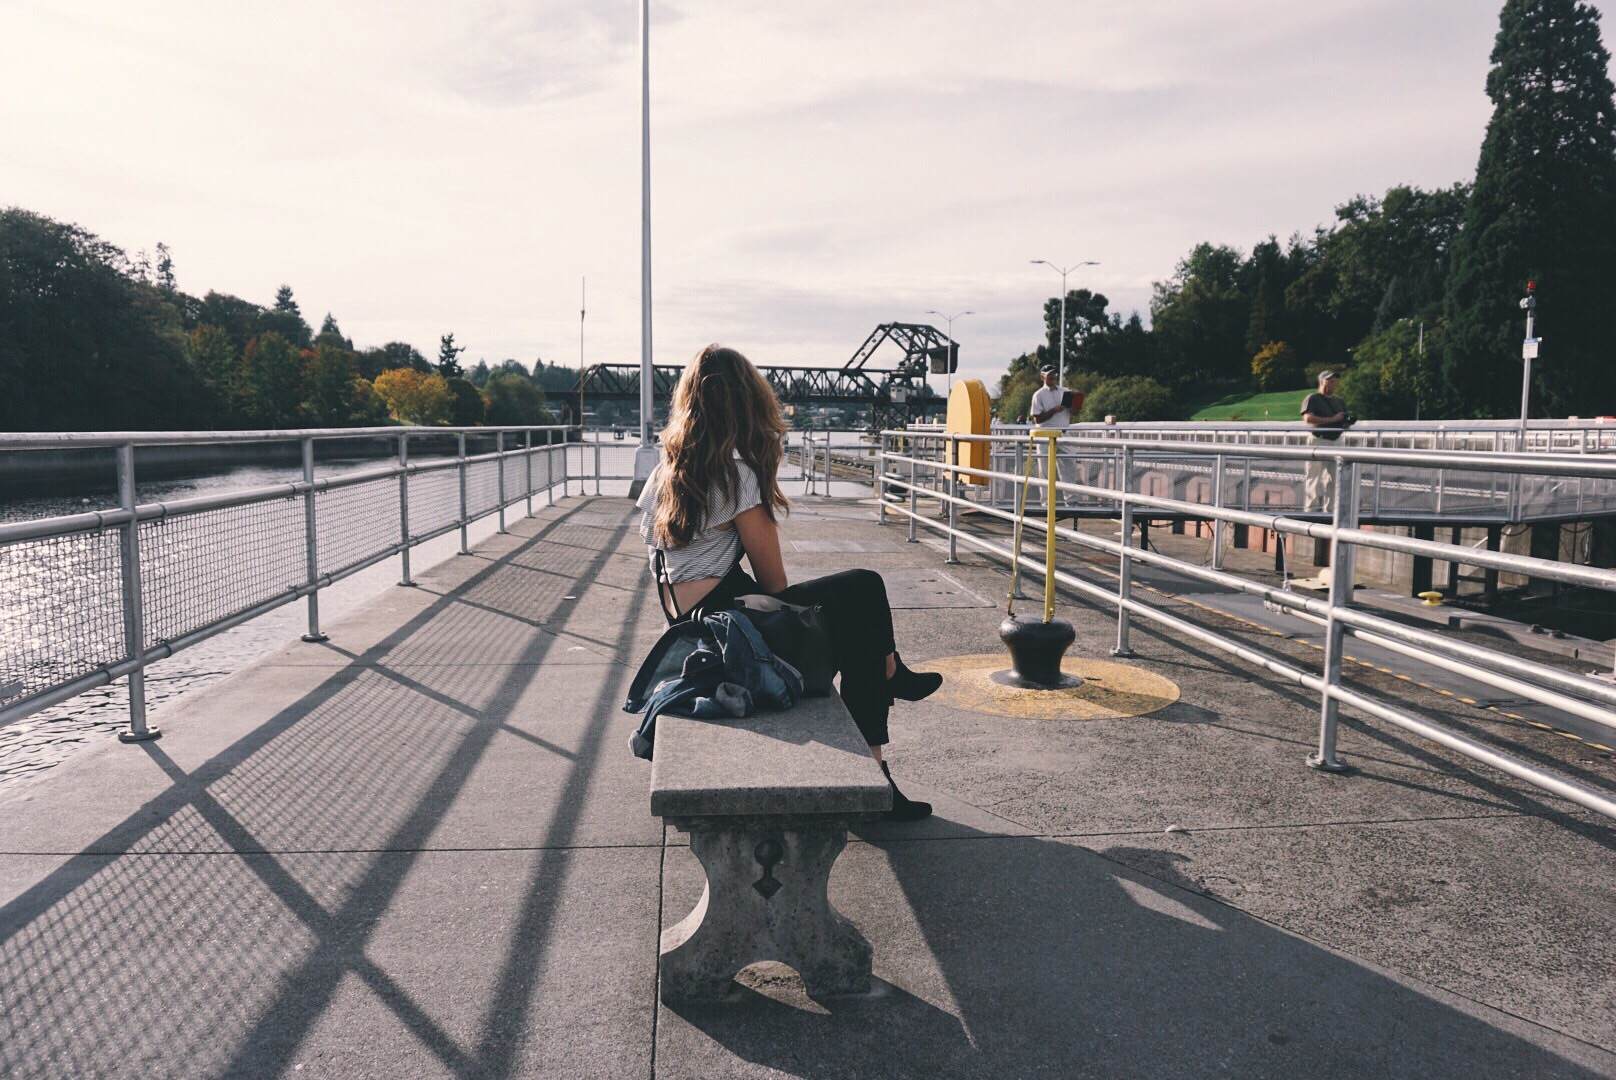 The Locks in Ballard. Quiet, serene, and perfect.